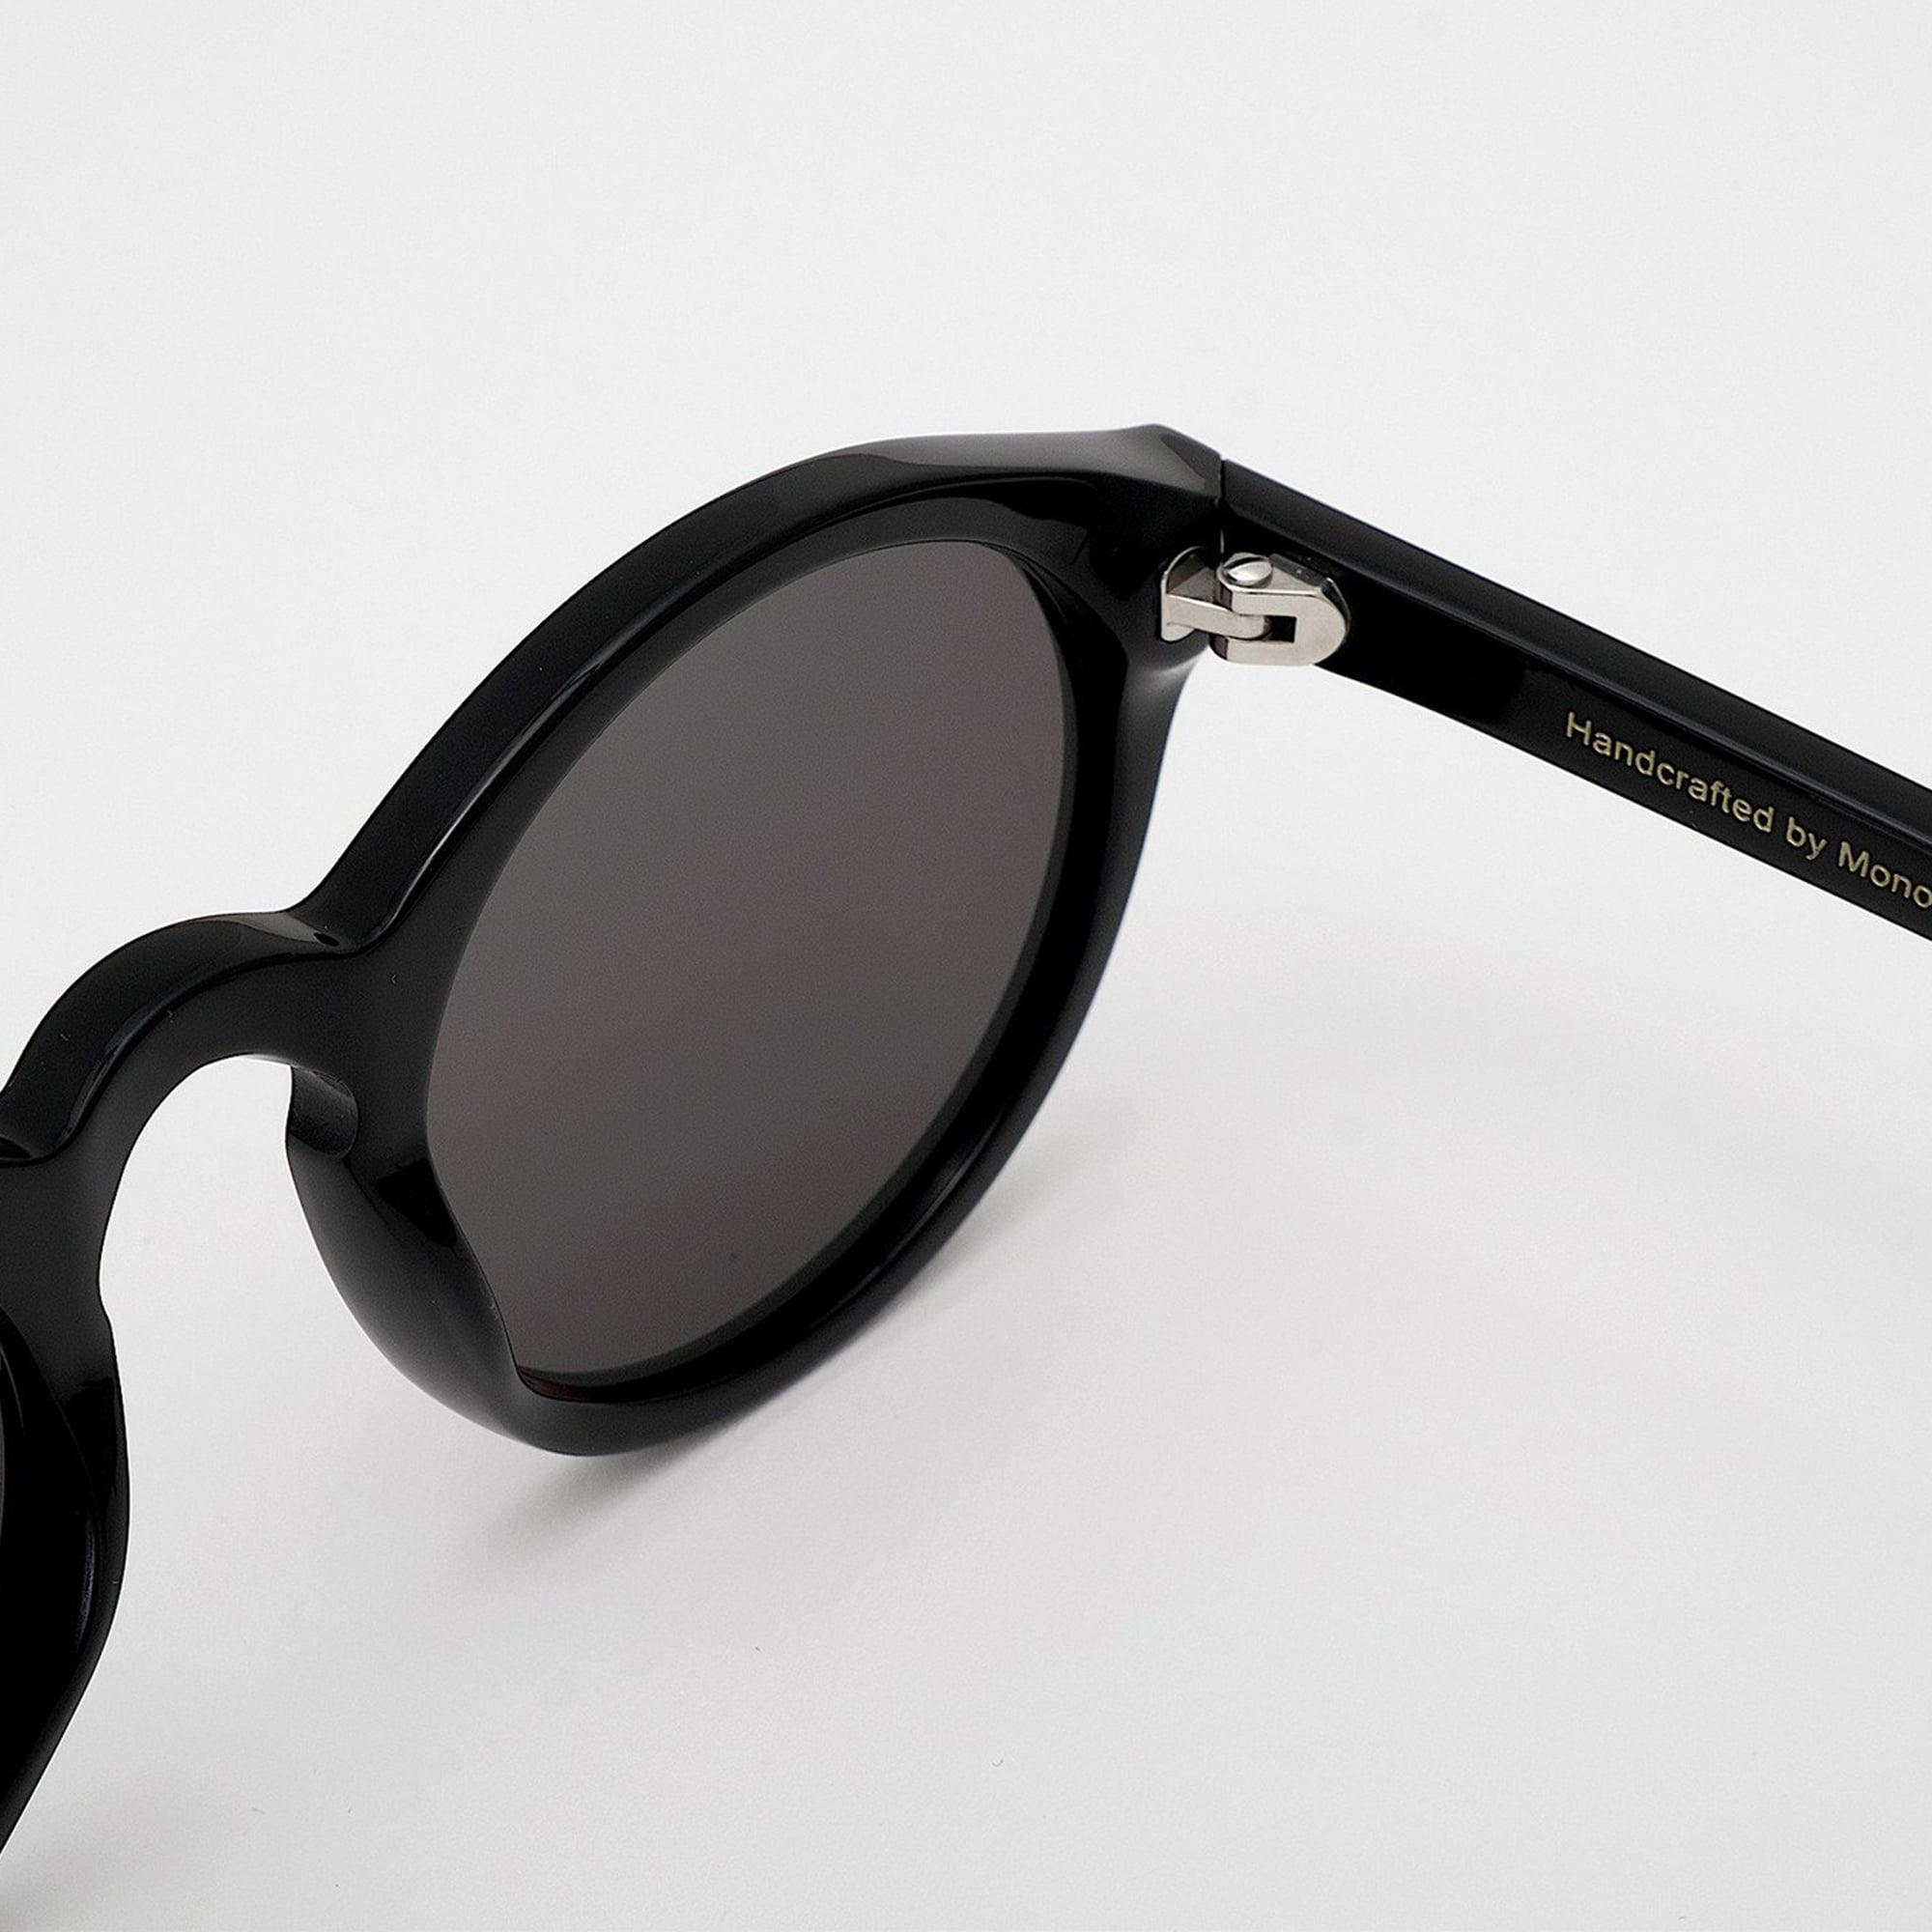 6daae2bb38d96 Monokel Eyewear Barstow Sunglasses (Black) at Dandy Fellow